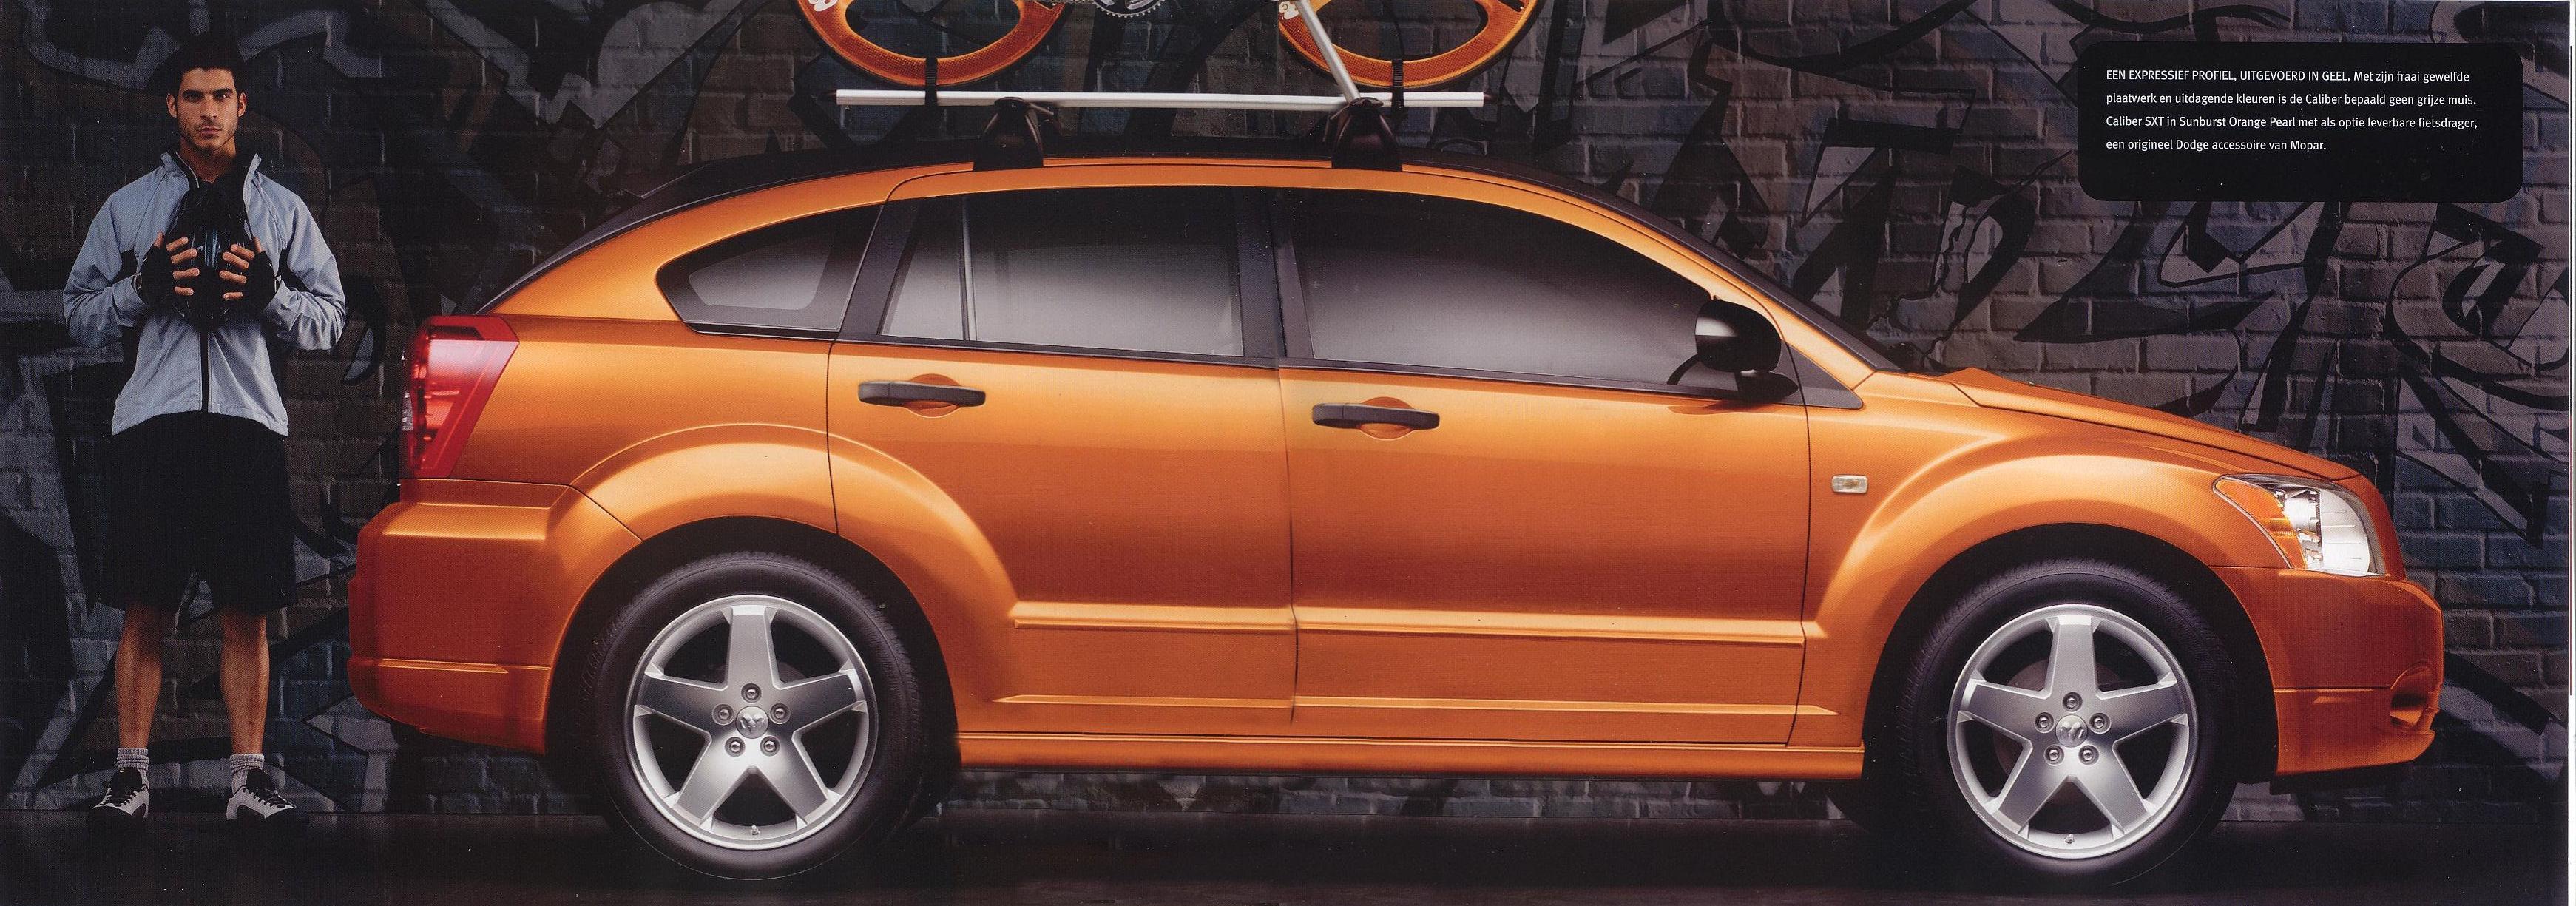 2007 Dodge Caliber Brochure